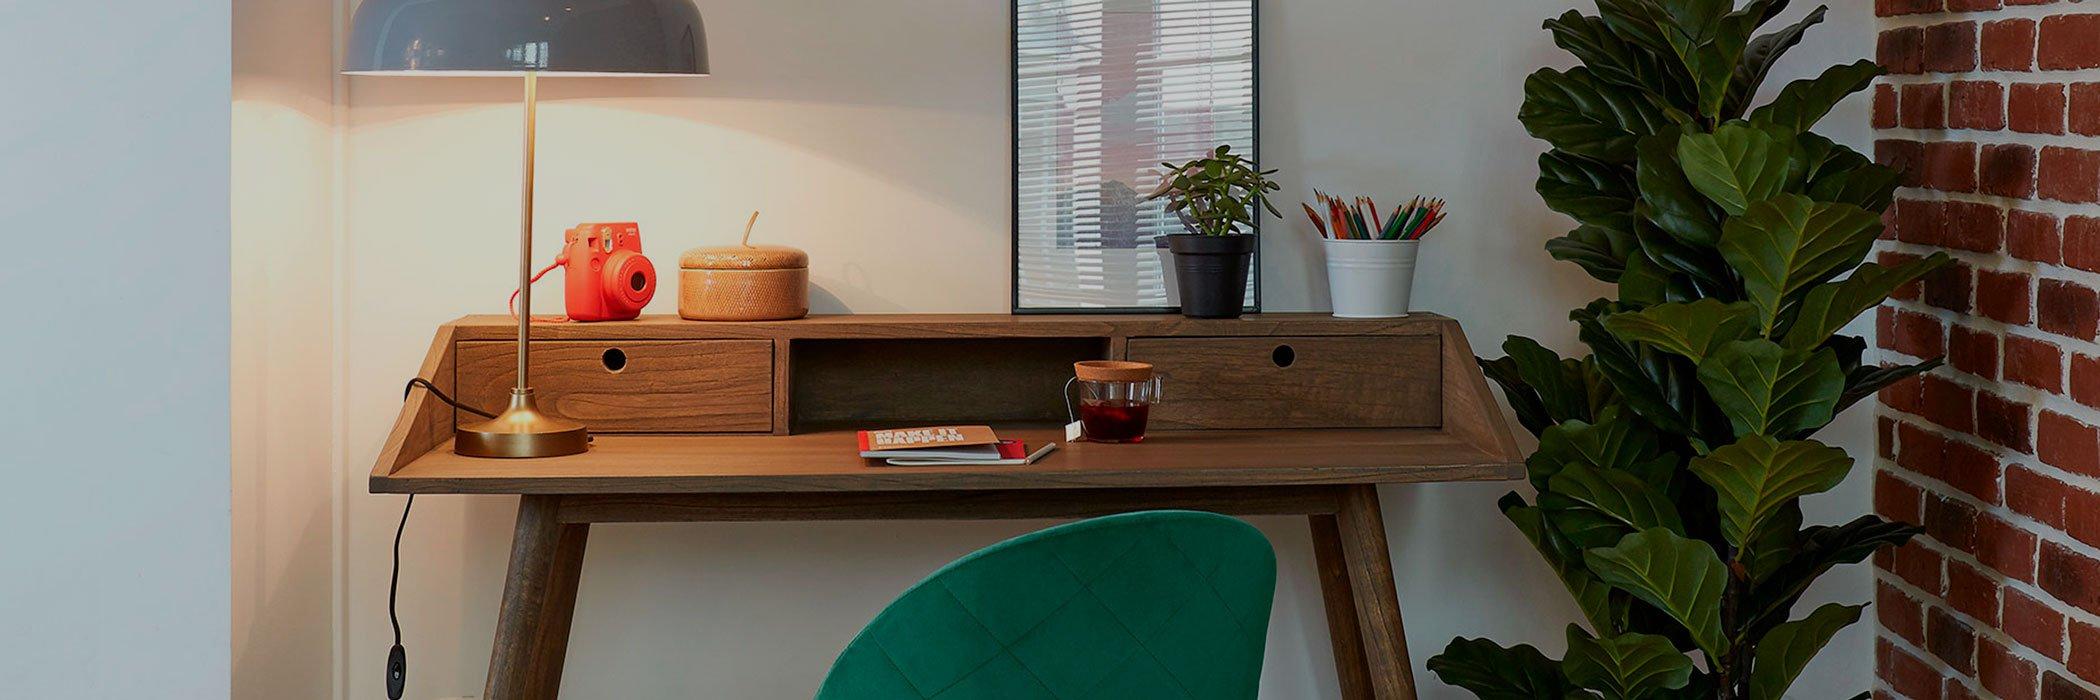 muebles-trabajar-casa.jpg